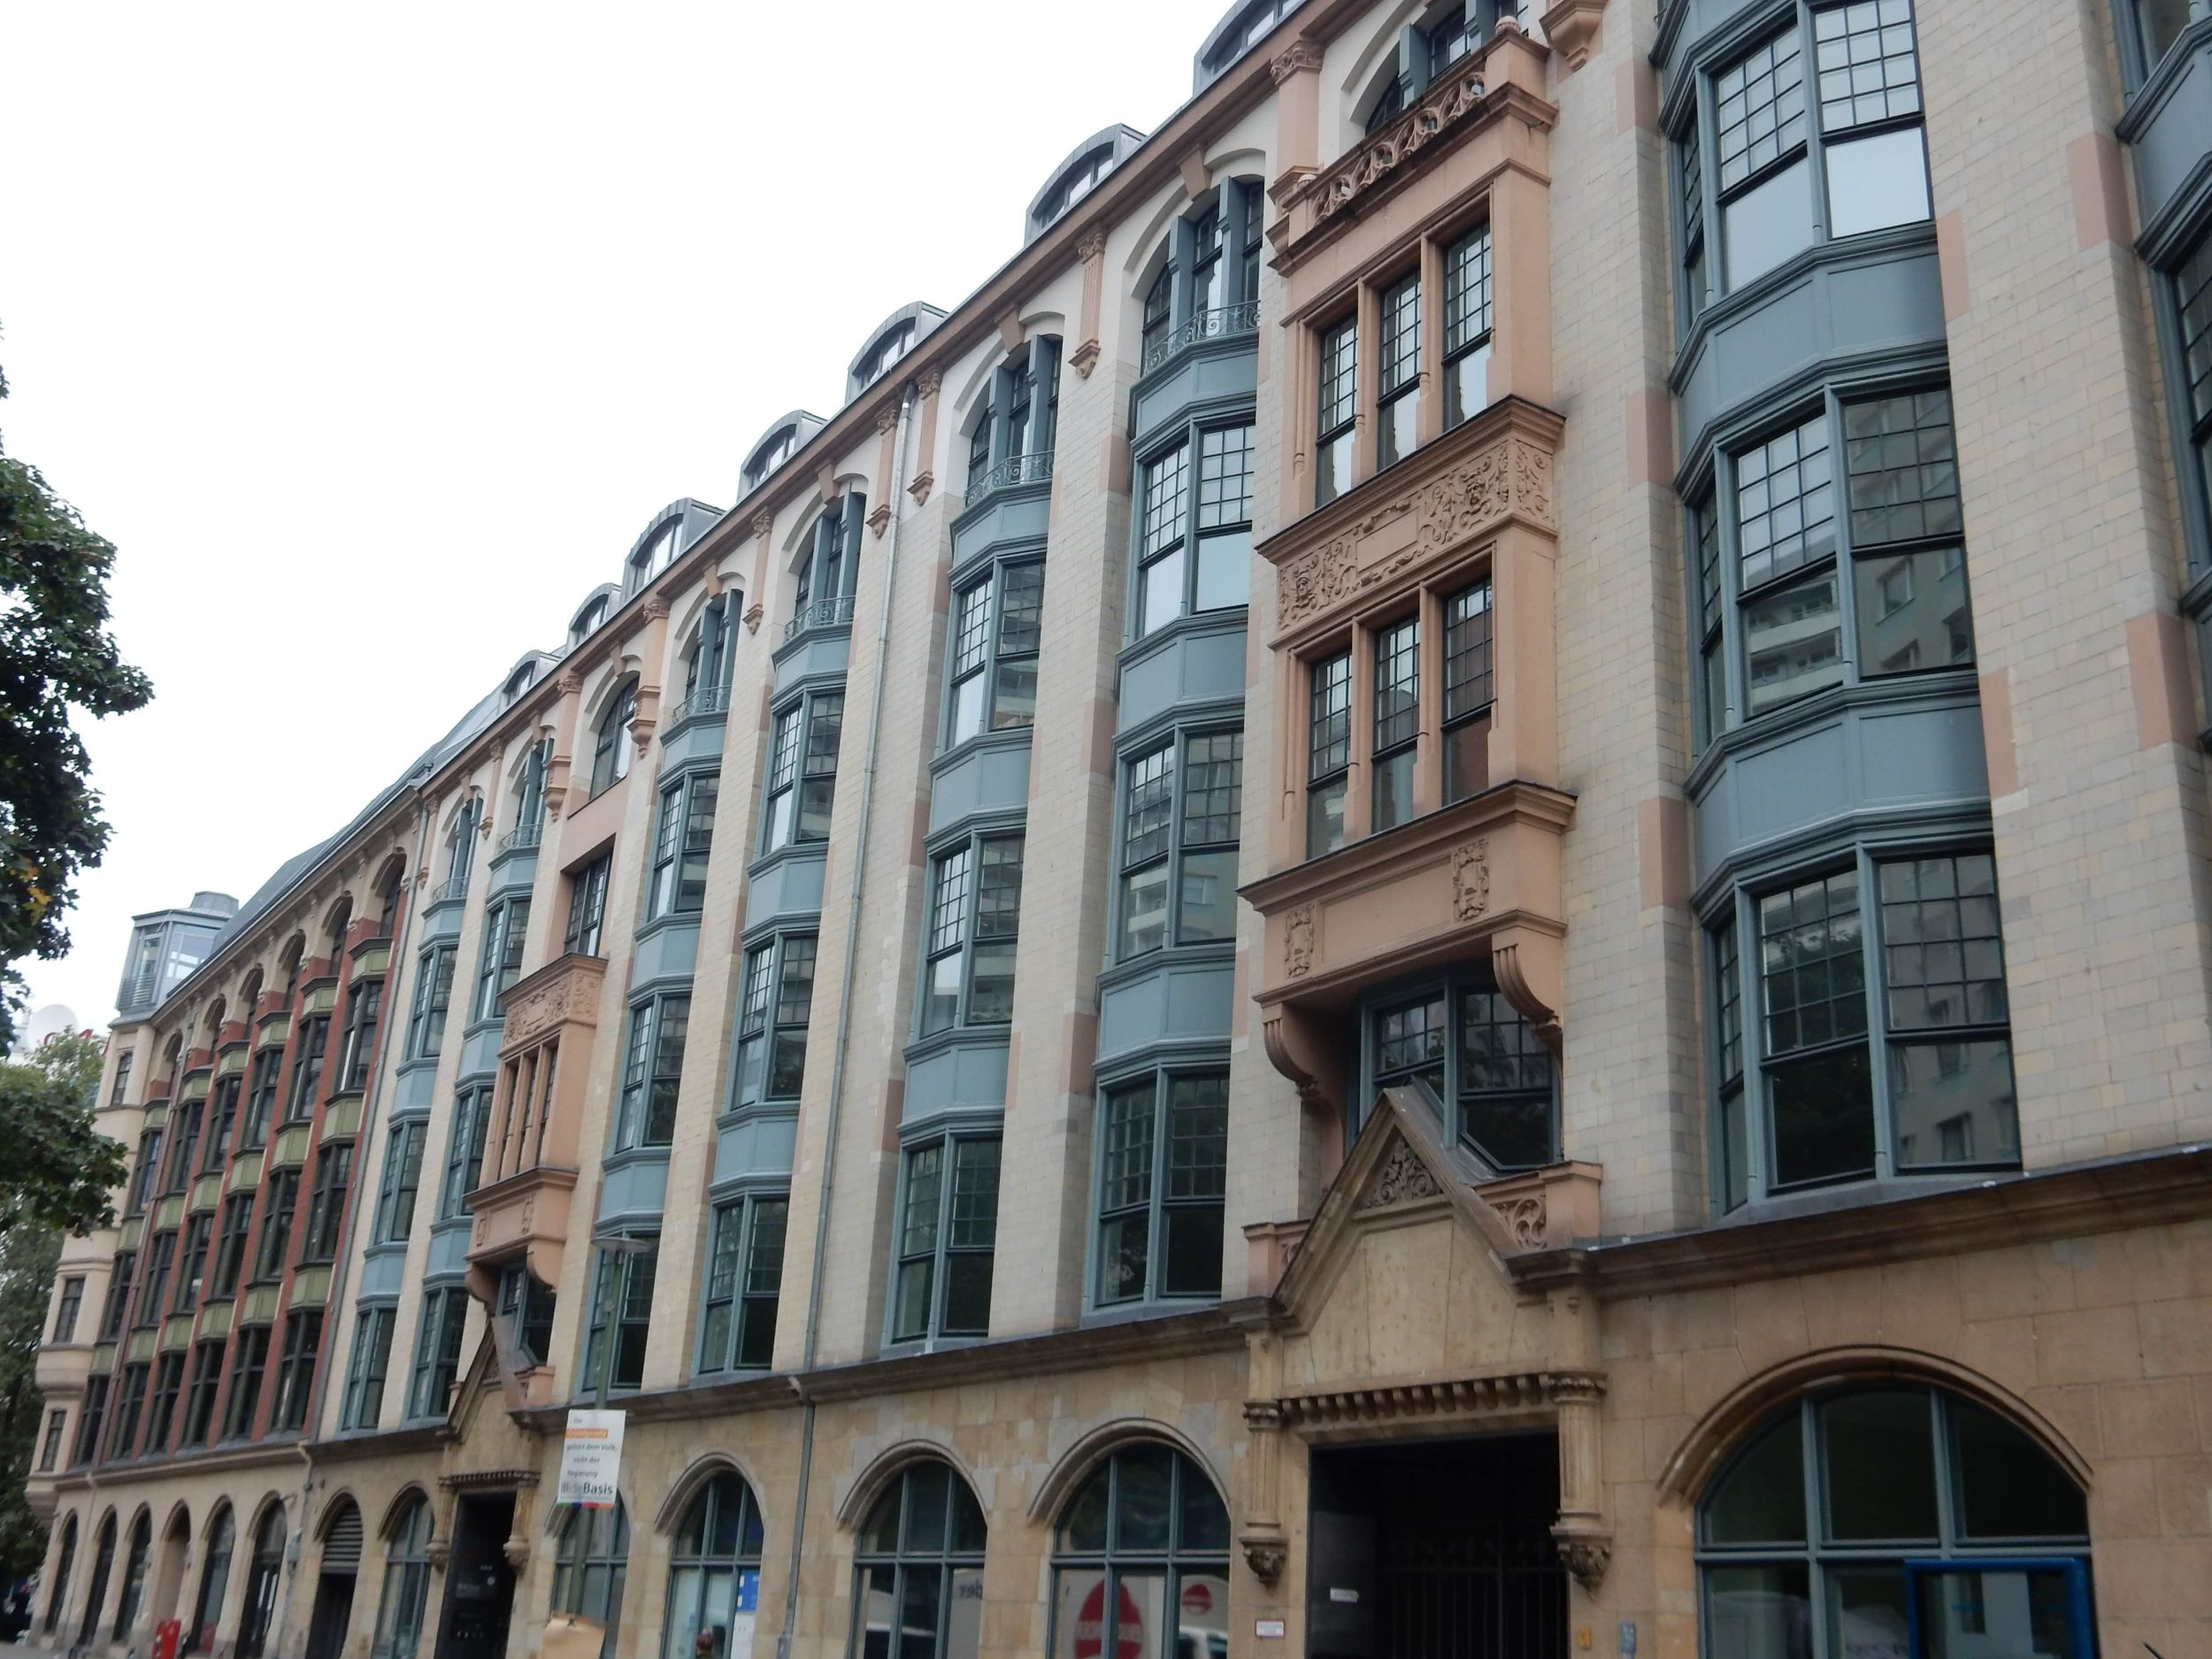 Rosenstraße Berlin